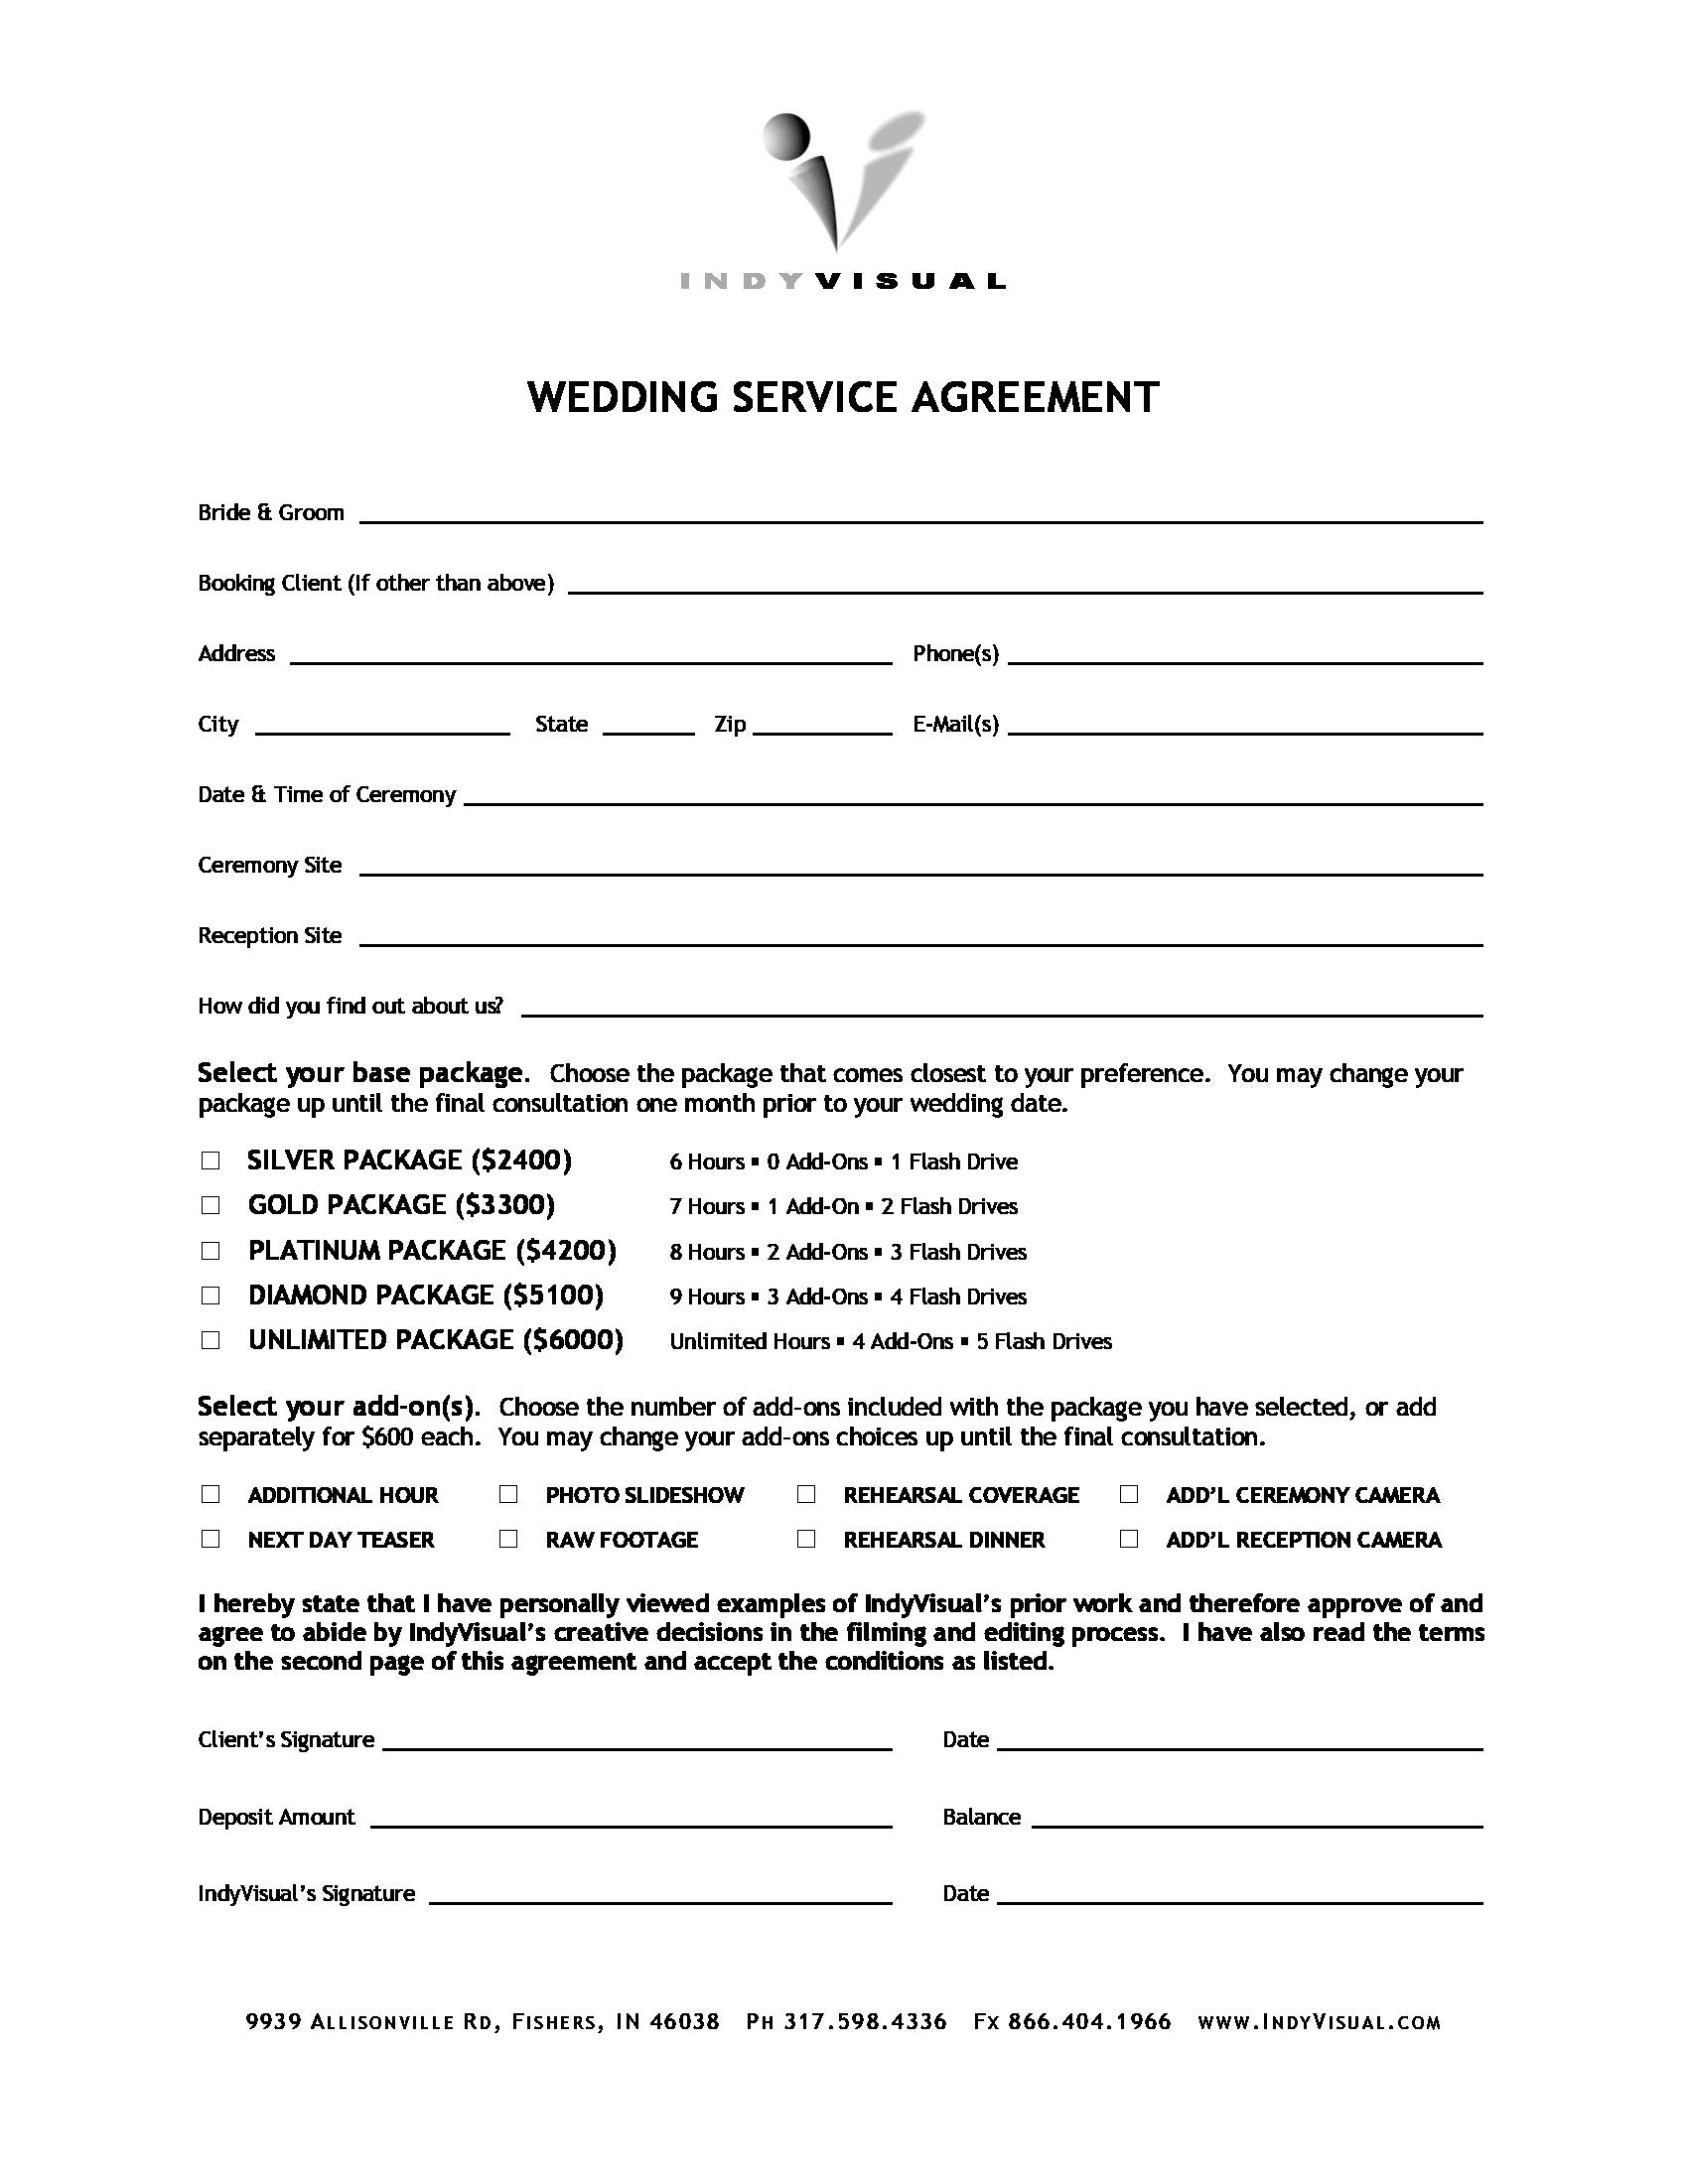 wedding service agreement form 1